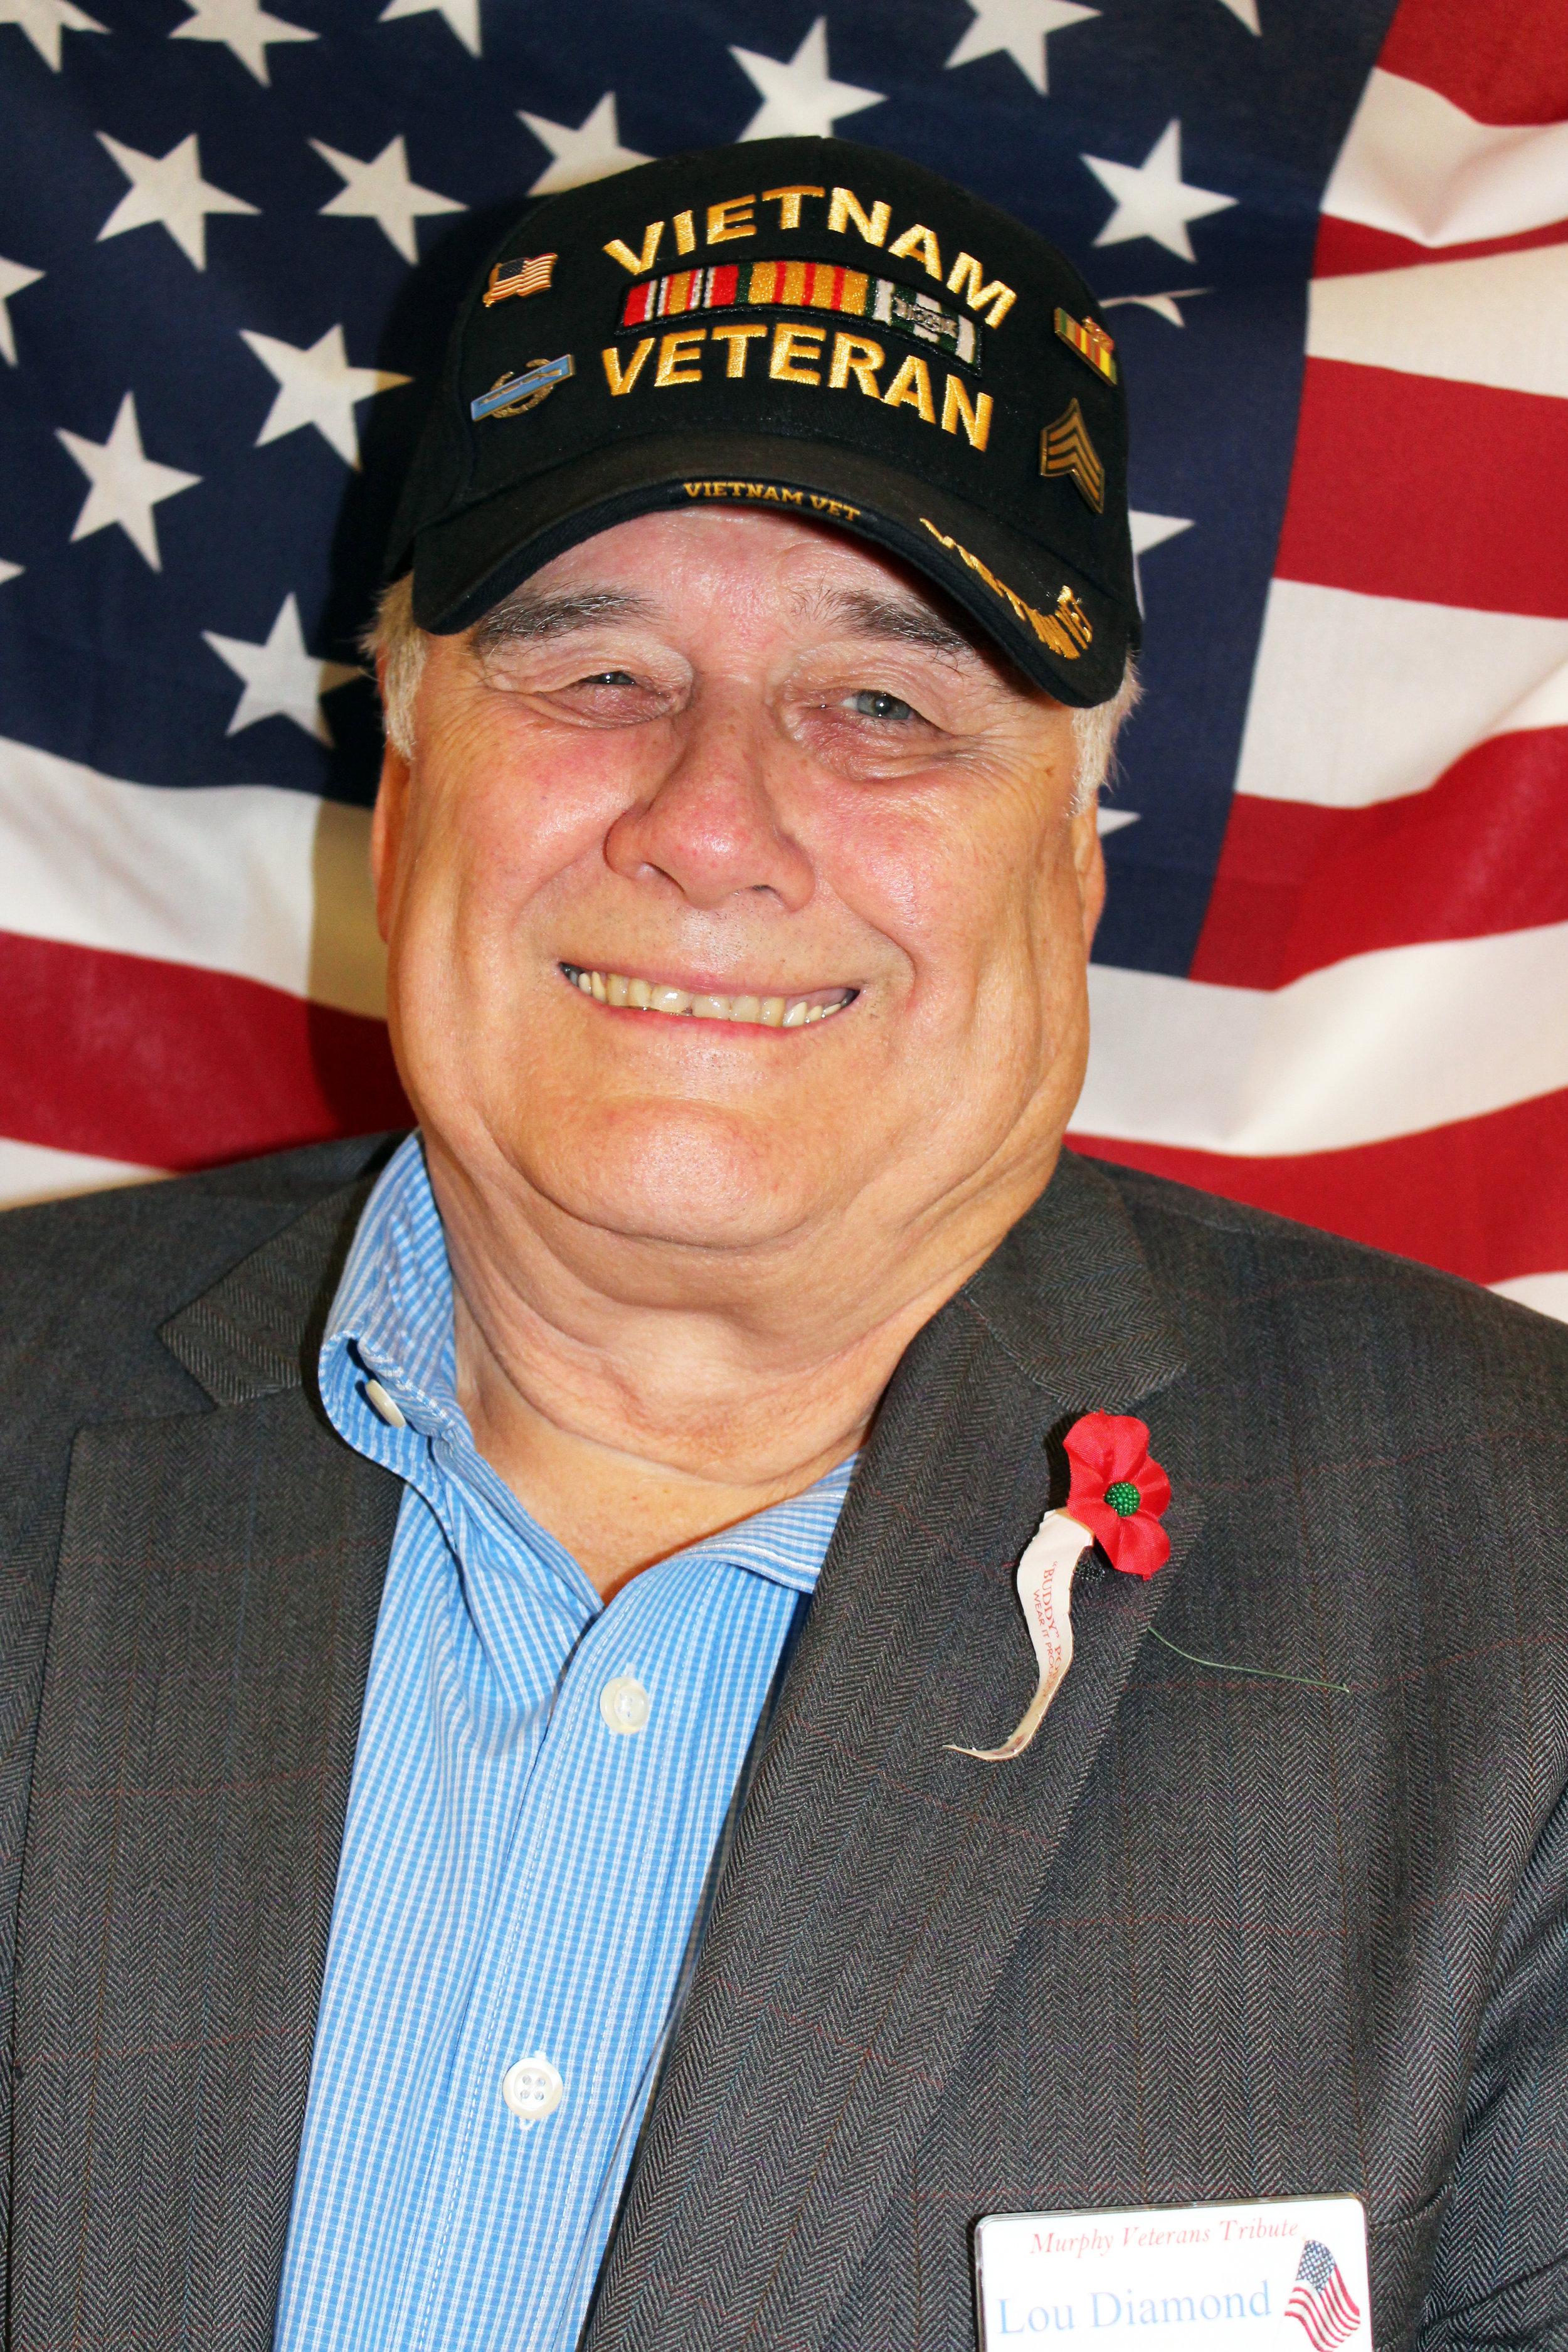 Veterans Lou Diamond.jpg